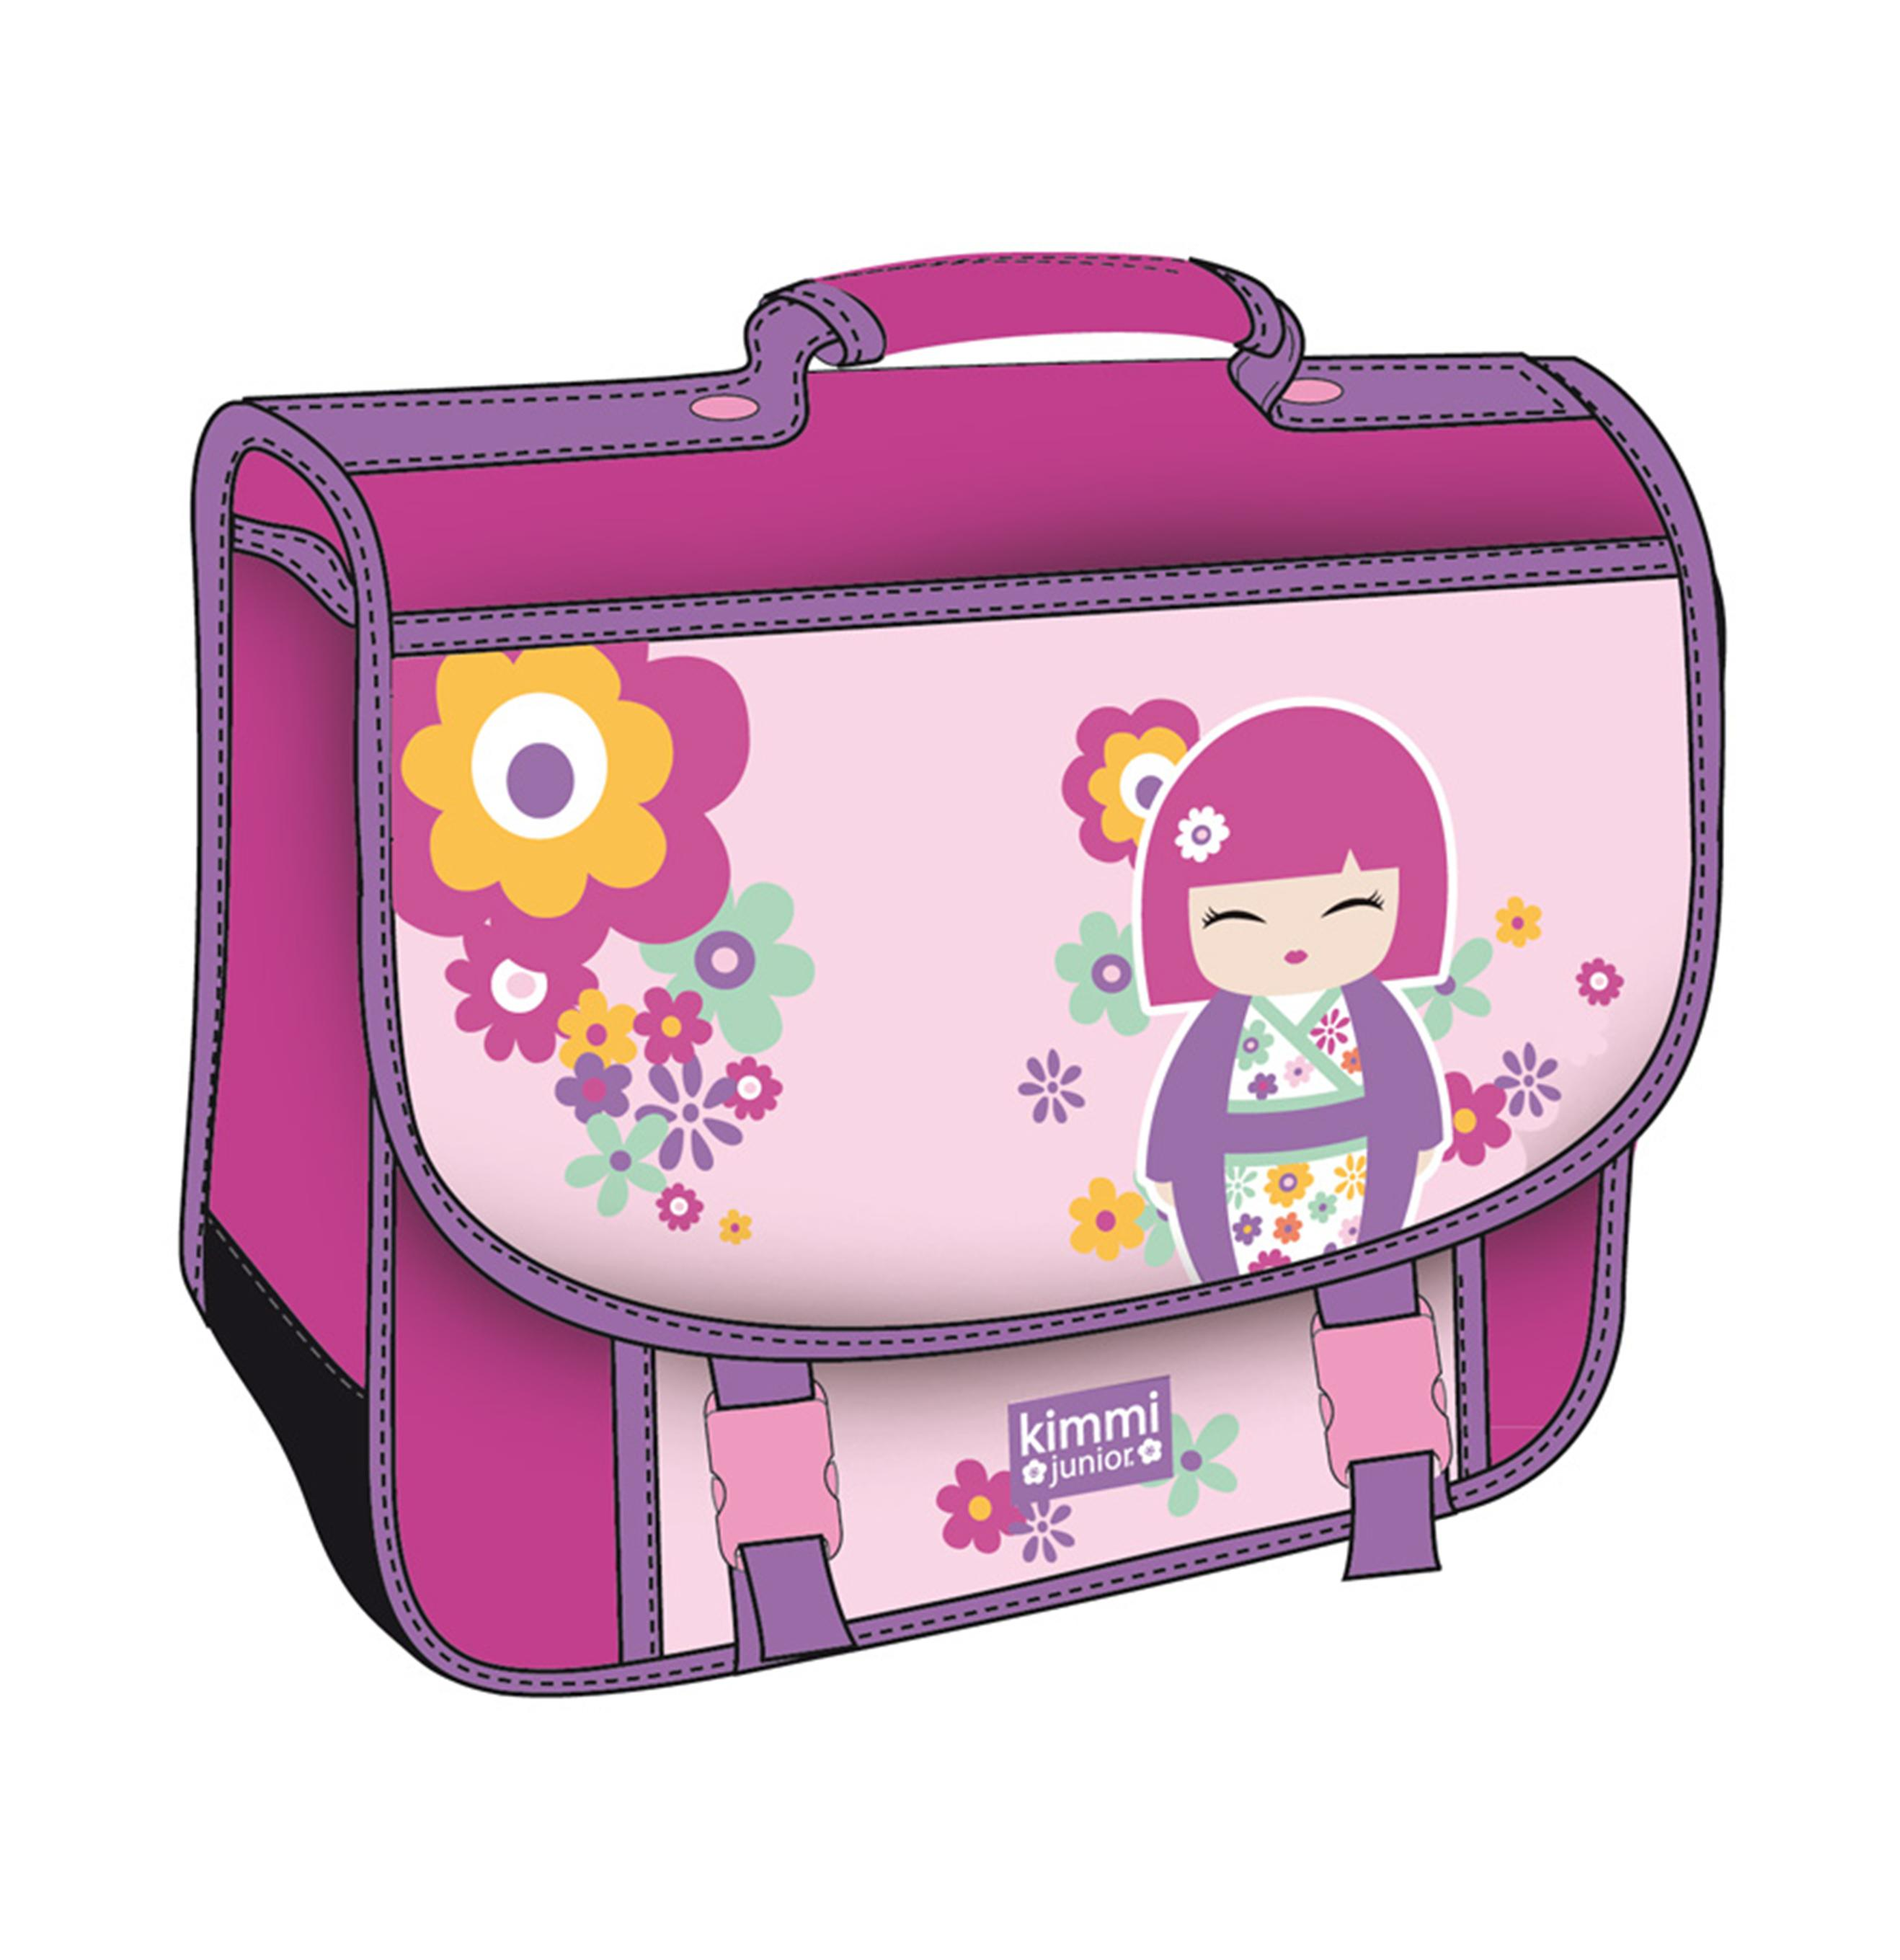 kokeshi rentr e scolaire cartable 41 cm kimmi junior. Black Bedroom Furniture Sets. Home Design Ideas